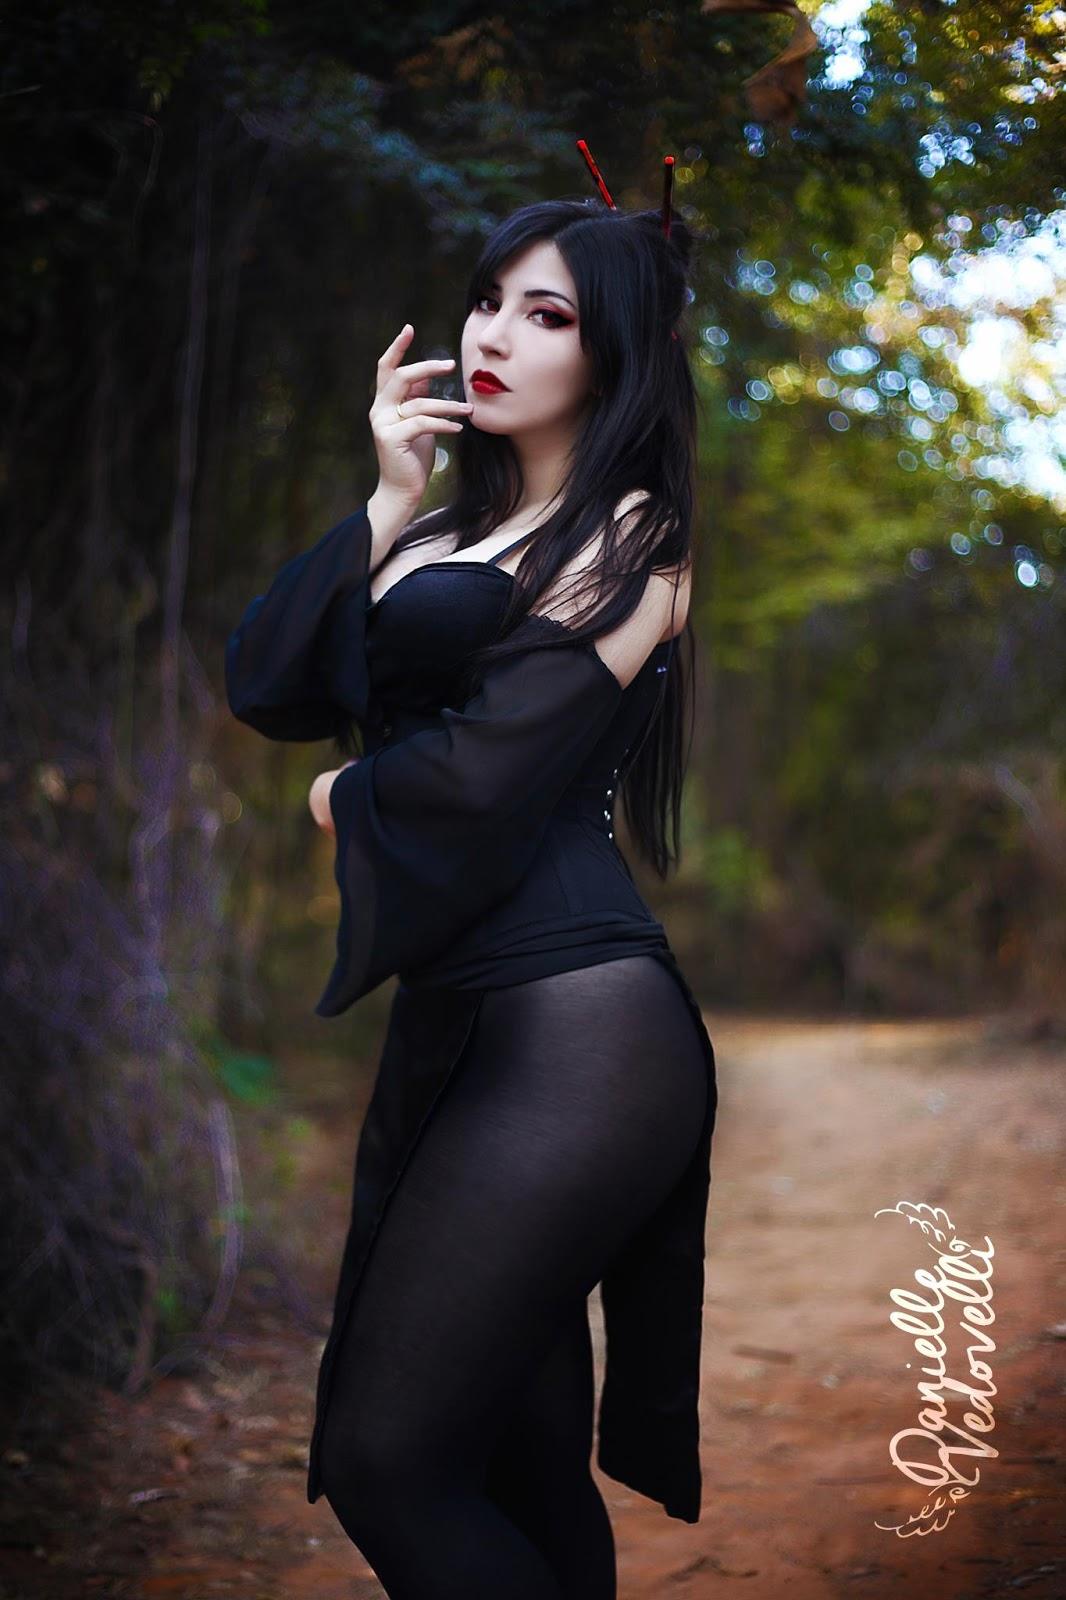 45 fotos da linda cosplayer Danielle Vedovelli